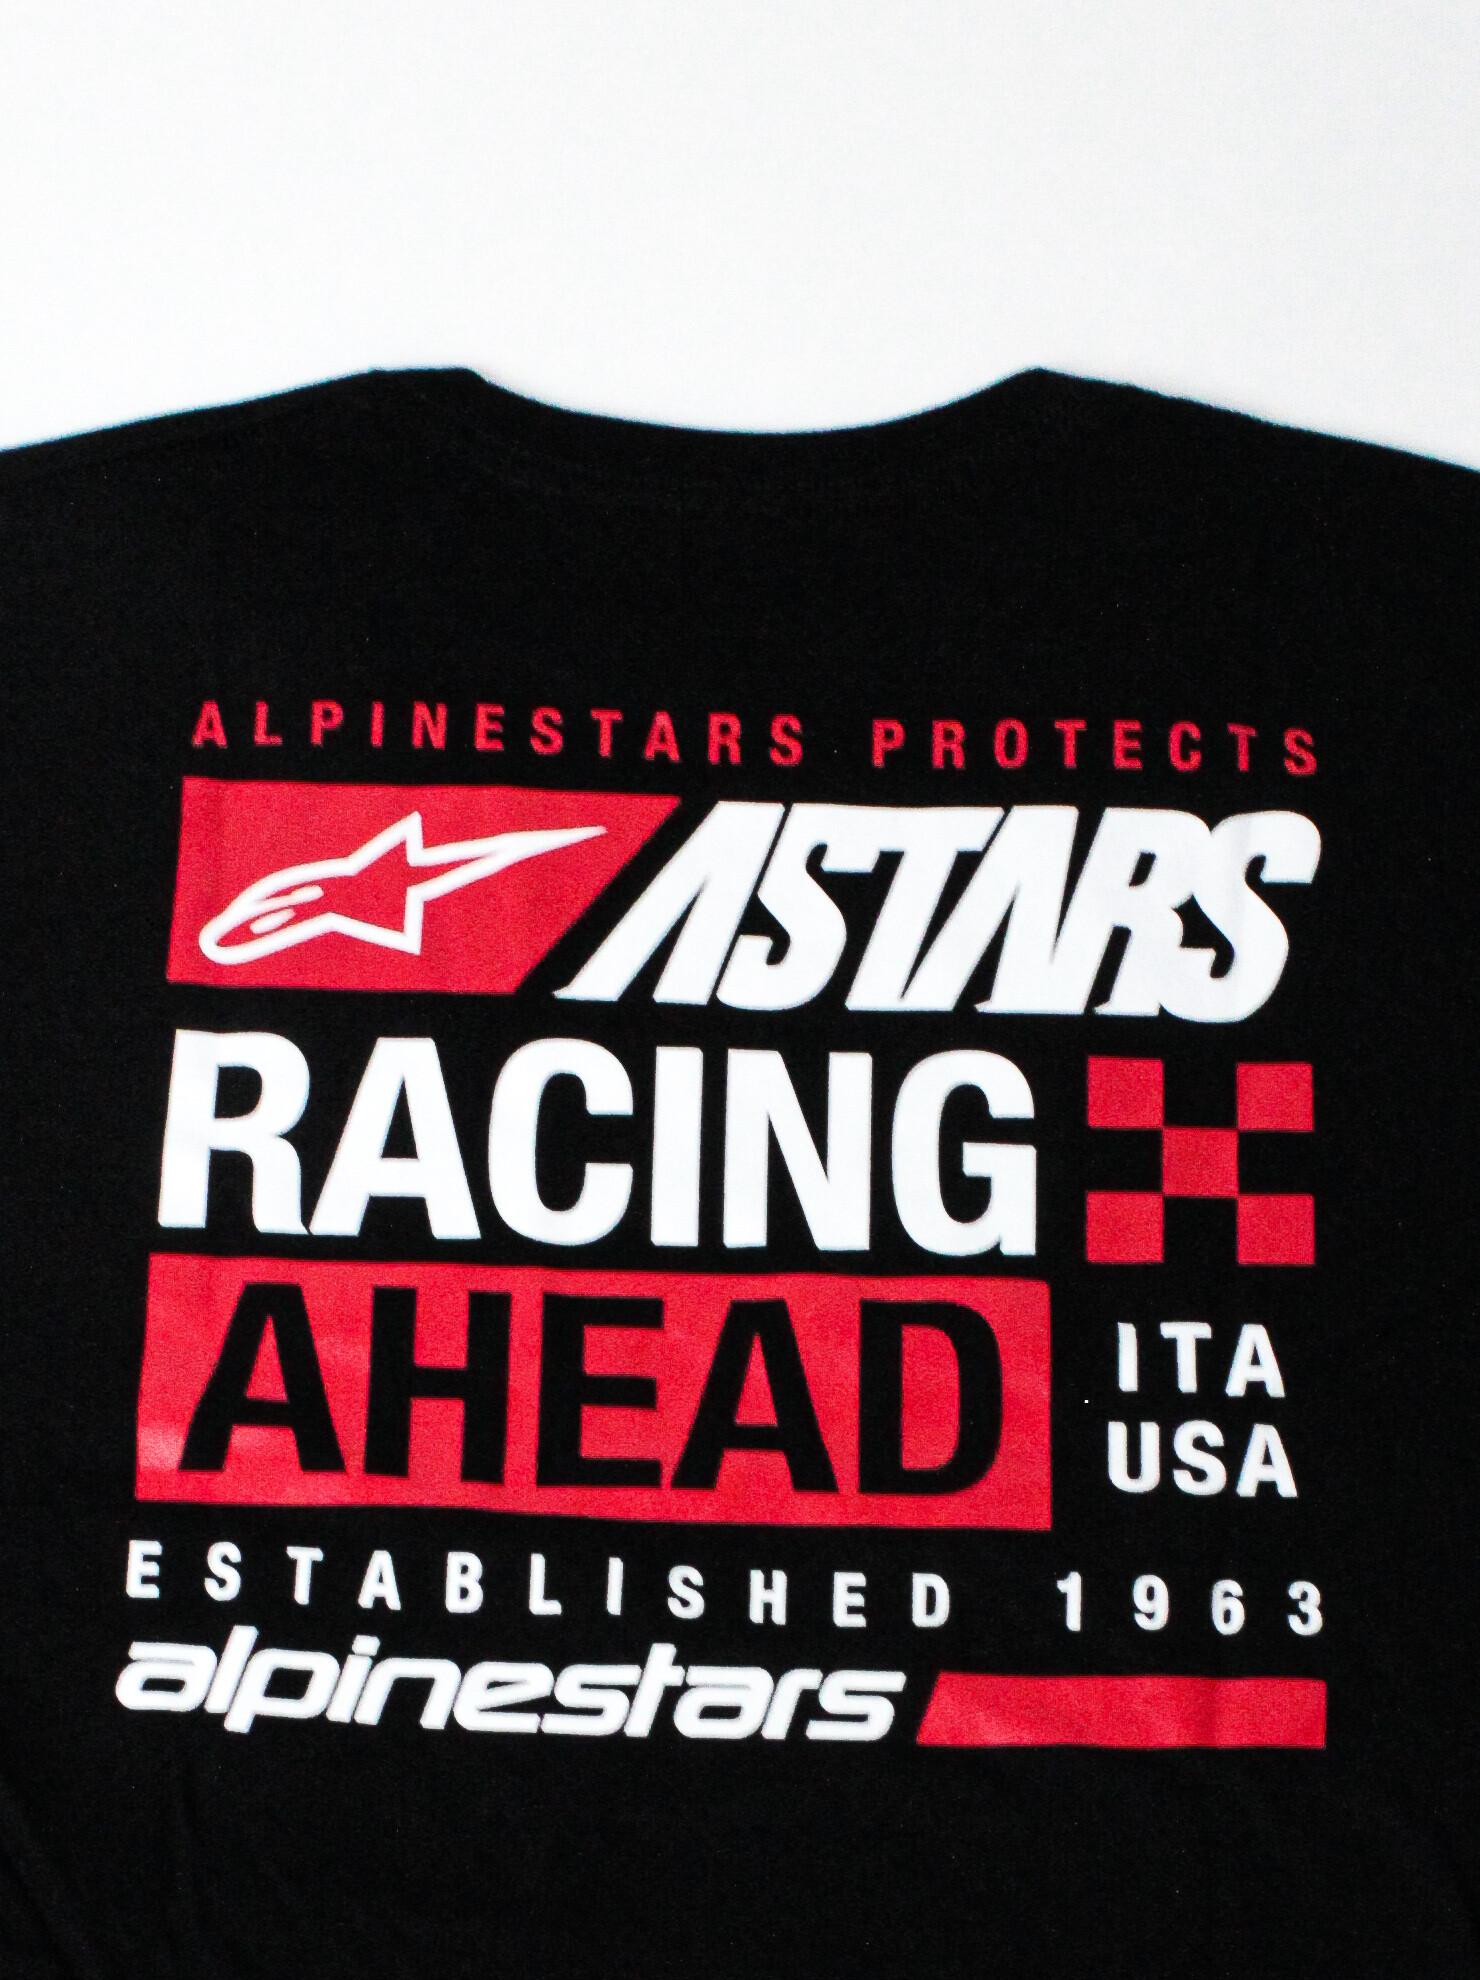 Alpinestars RACING AHEAD Established 1963 Tee – zwarte mannen T-shirt